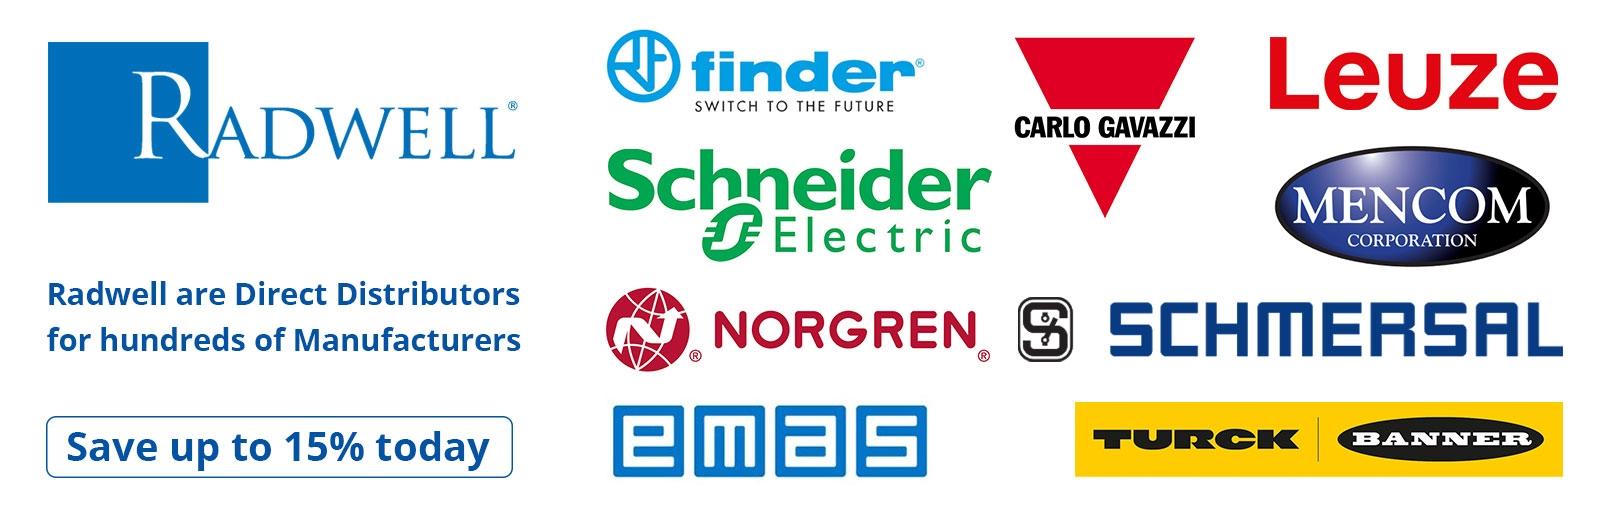 Radwell-Direct-Distribution-Automation-Manufacturers